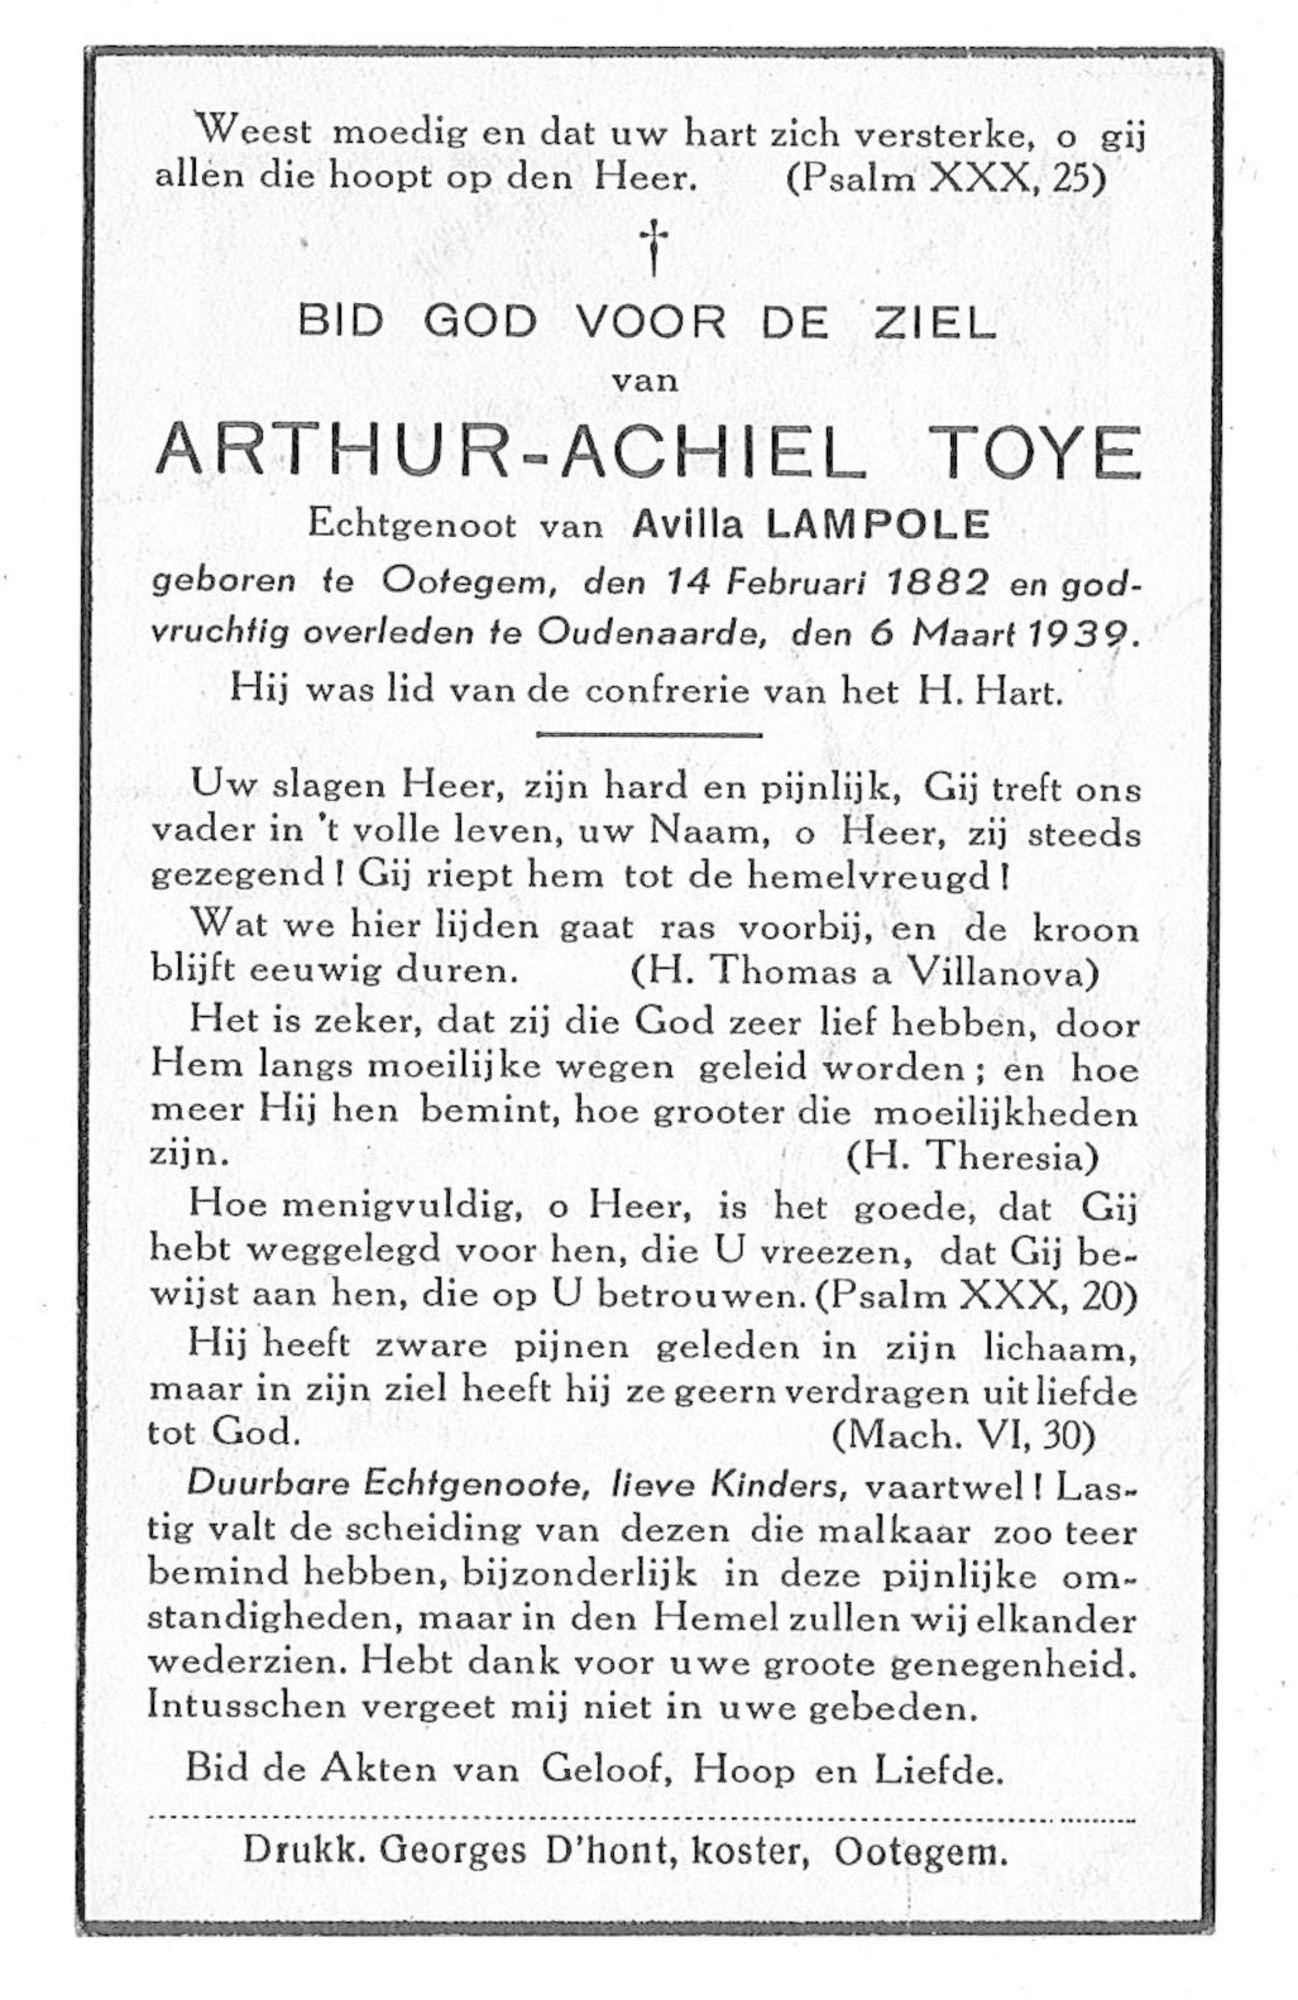 Arthur-Achiel Toye